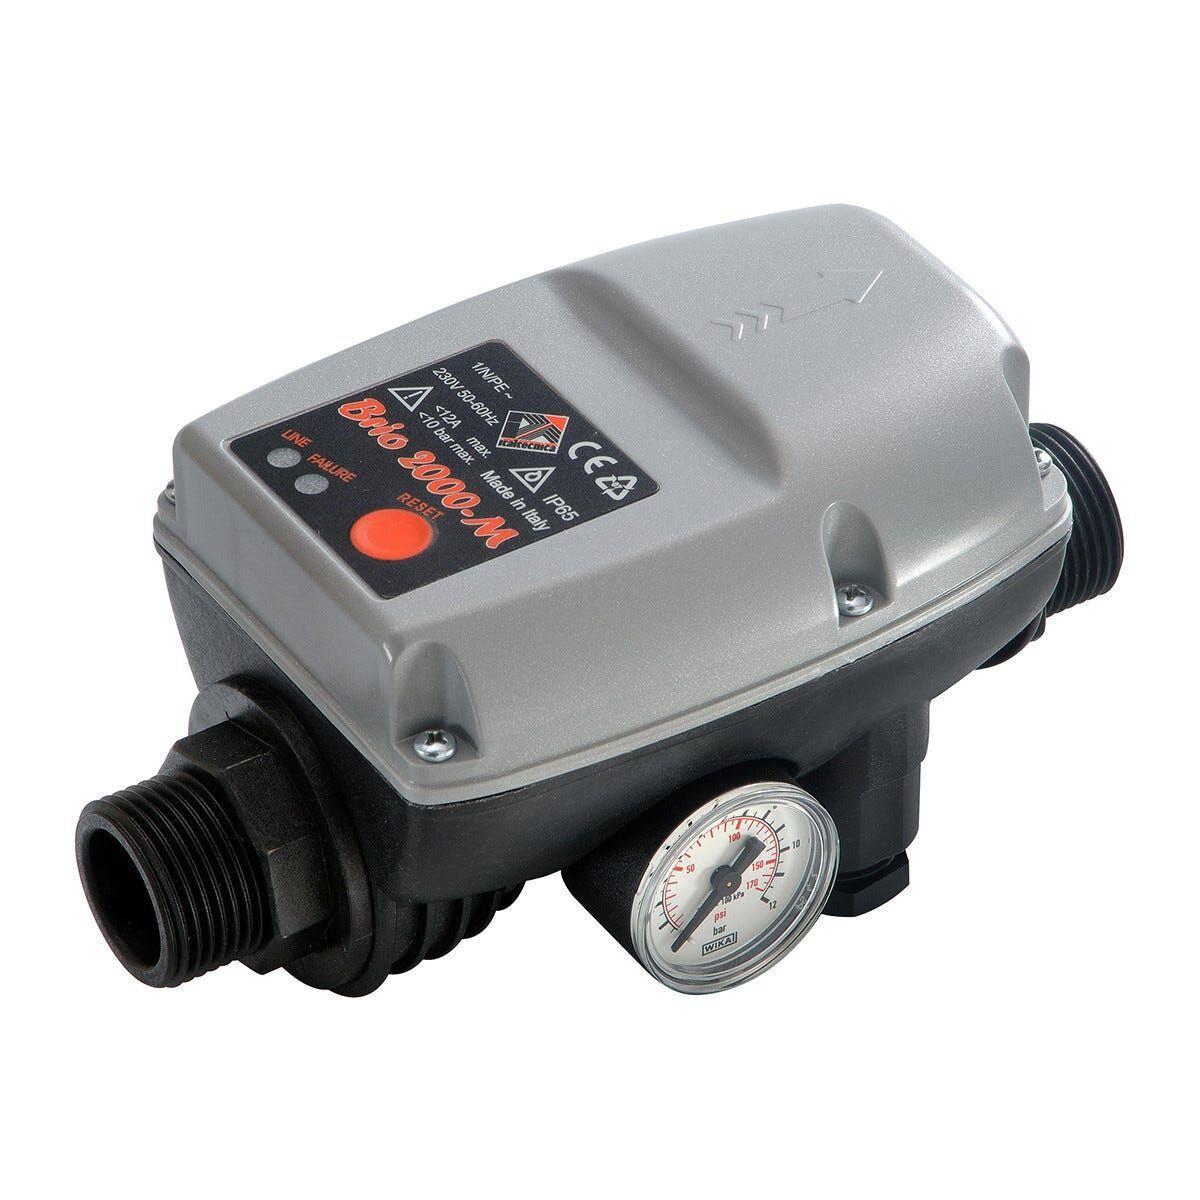 ITALTECNICA Pressoflussostato Regolabile  Brio 2000-M 1-3,5 Bar Attacco M 1''